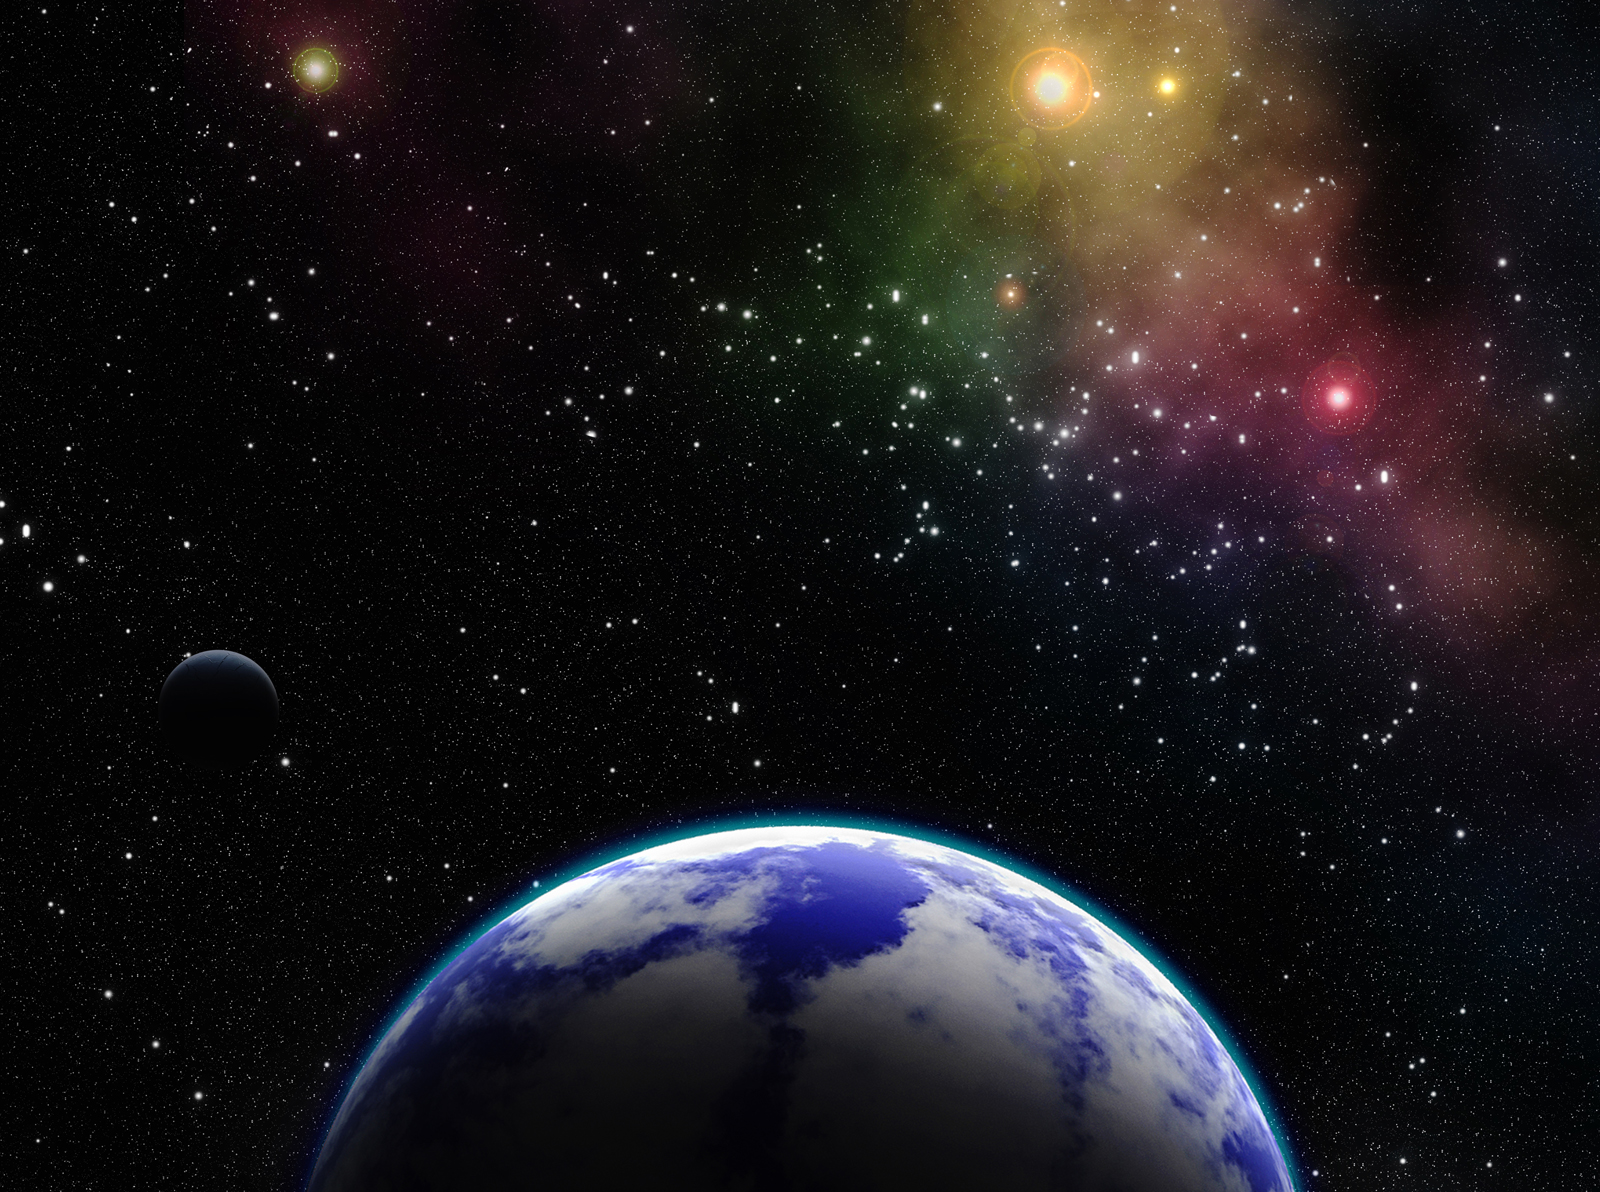 CAHIER planetes_c100